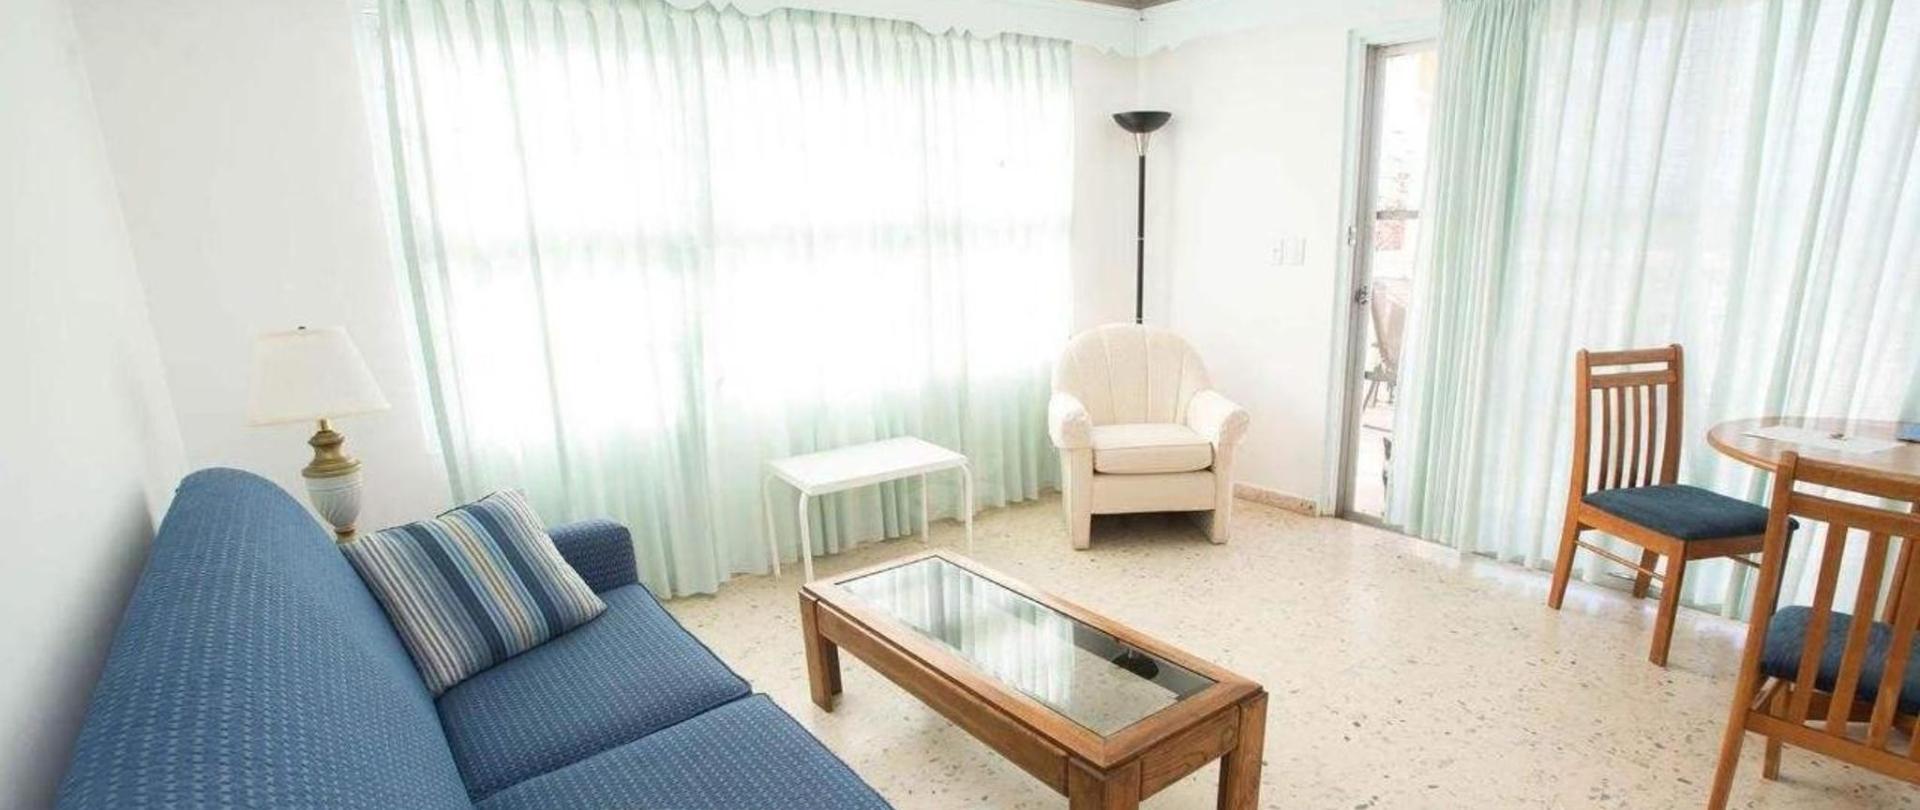 Living Vistalmar Aruba Accommodation.jpg